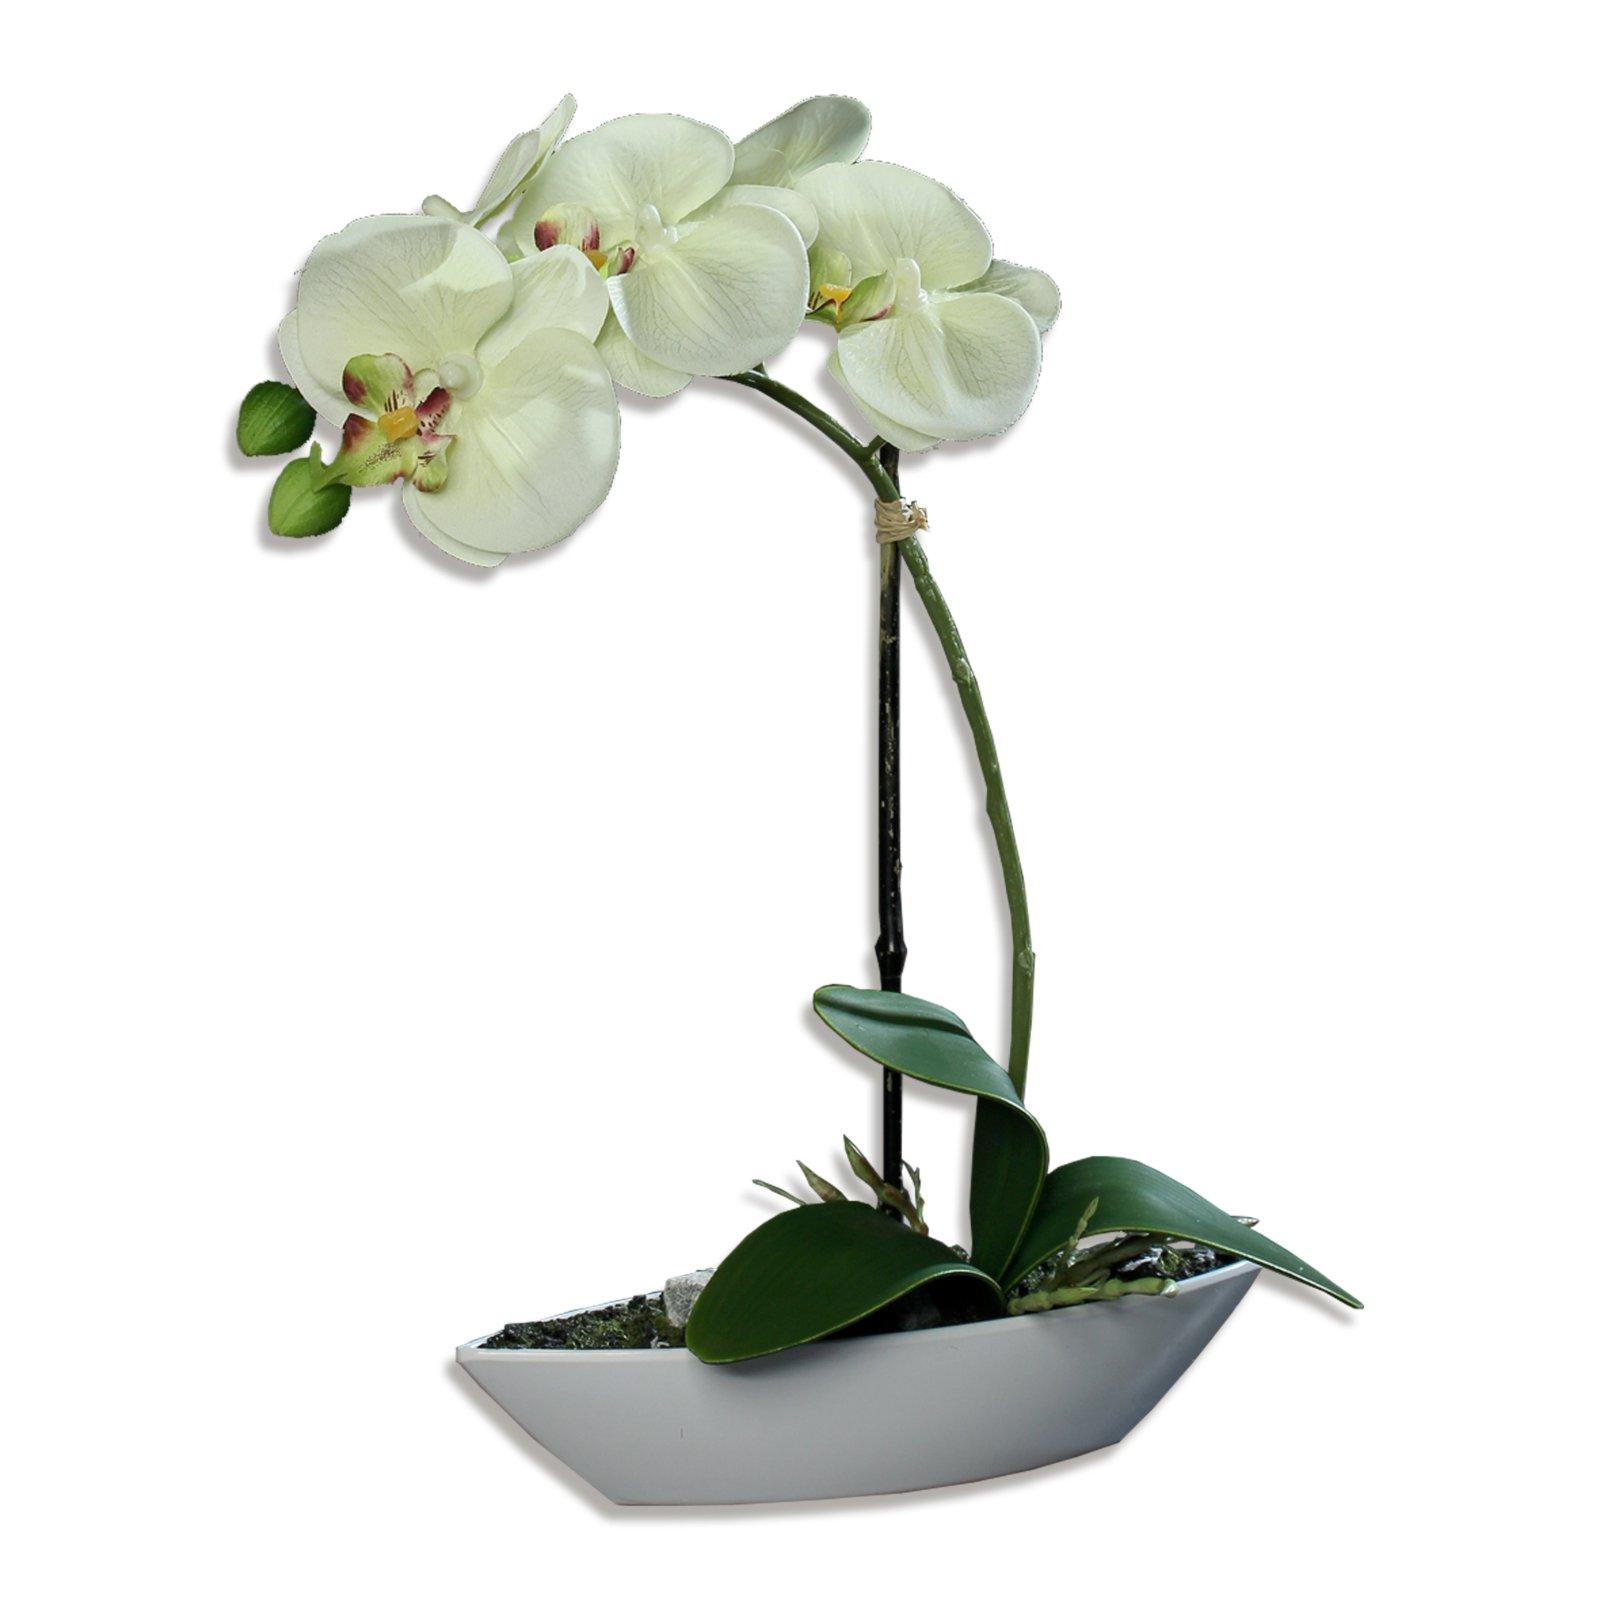 Orchidee-Phalaenopis - creme - Kunstpflanze